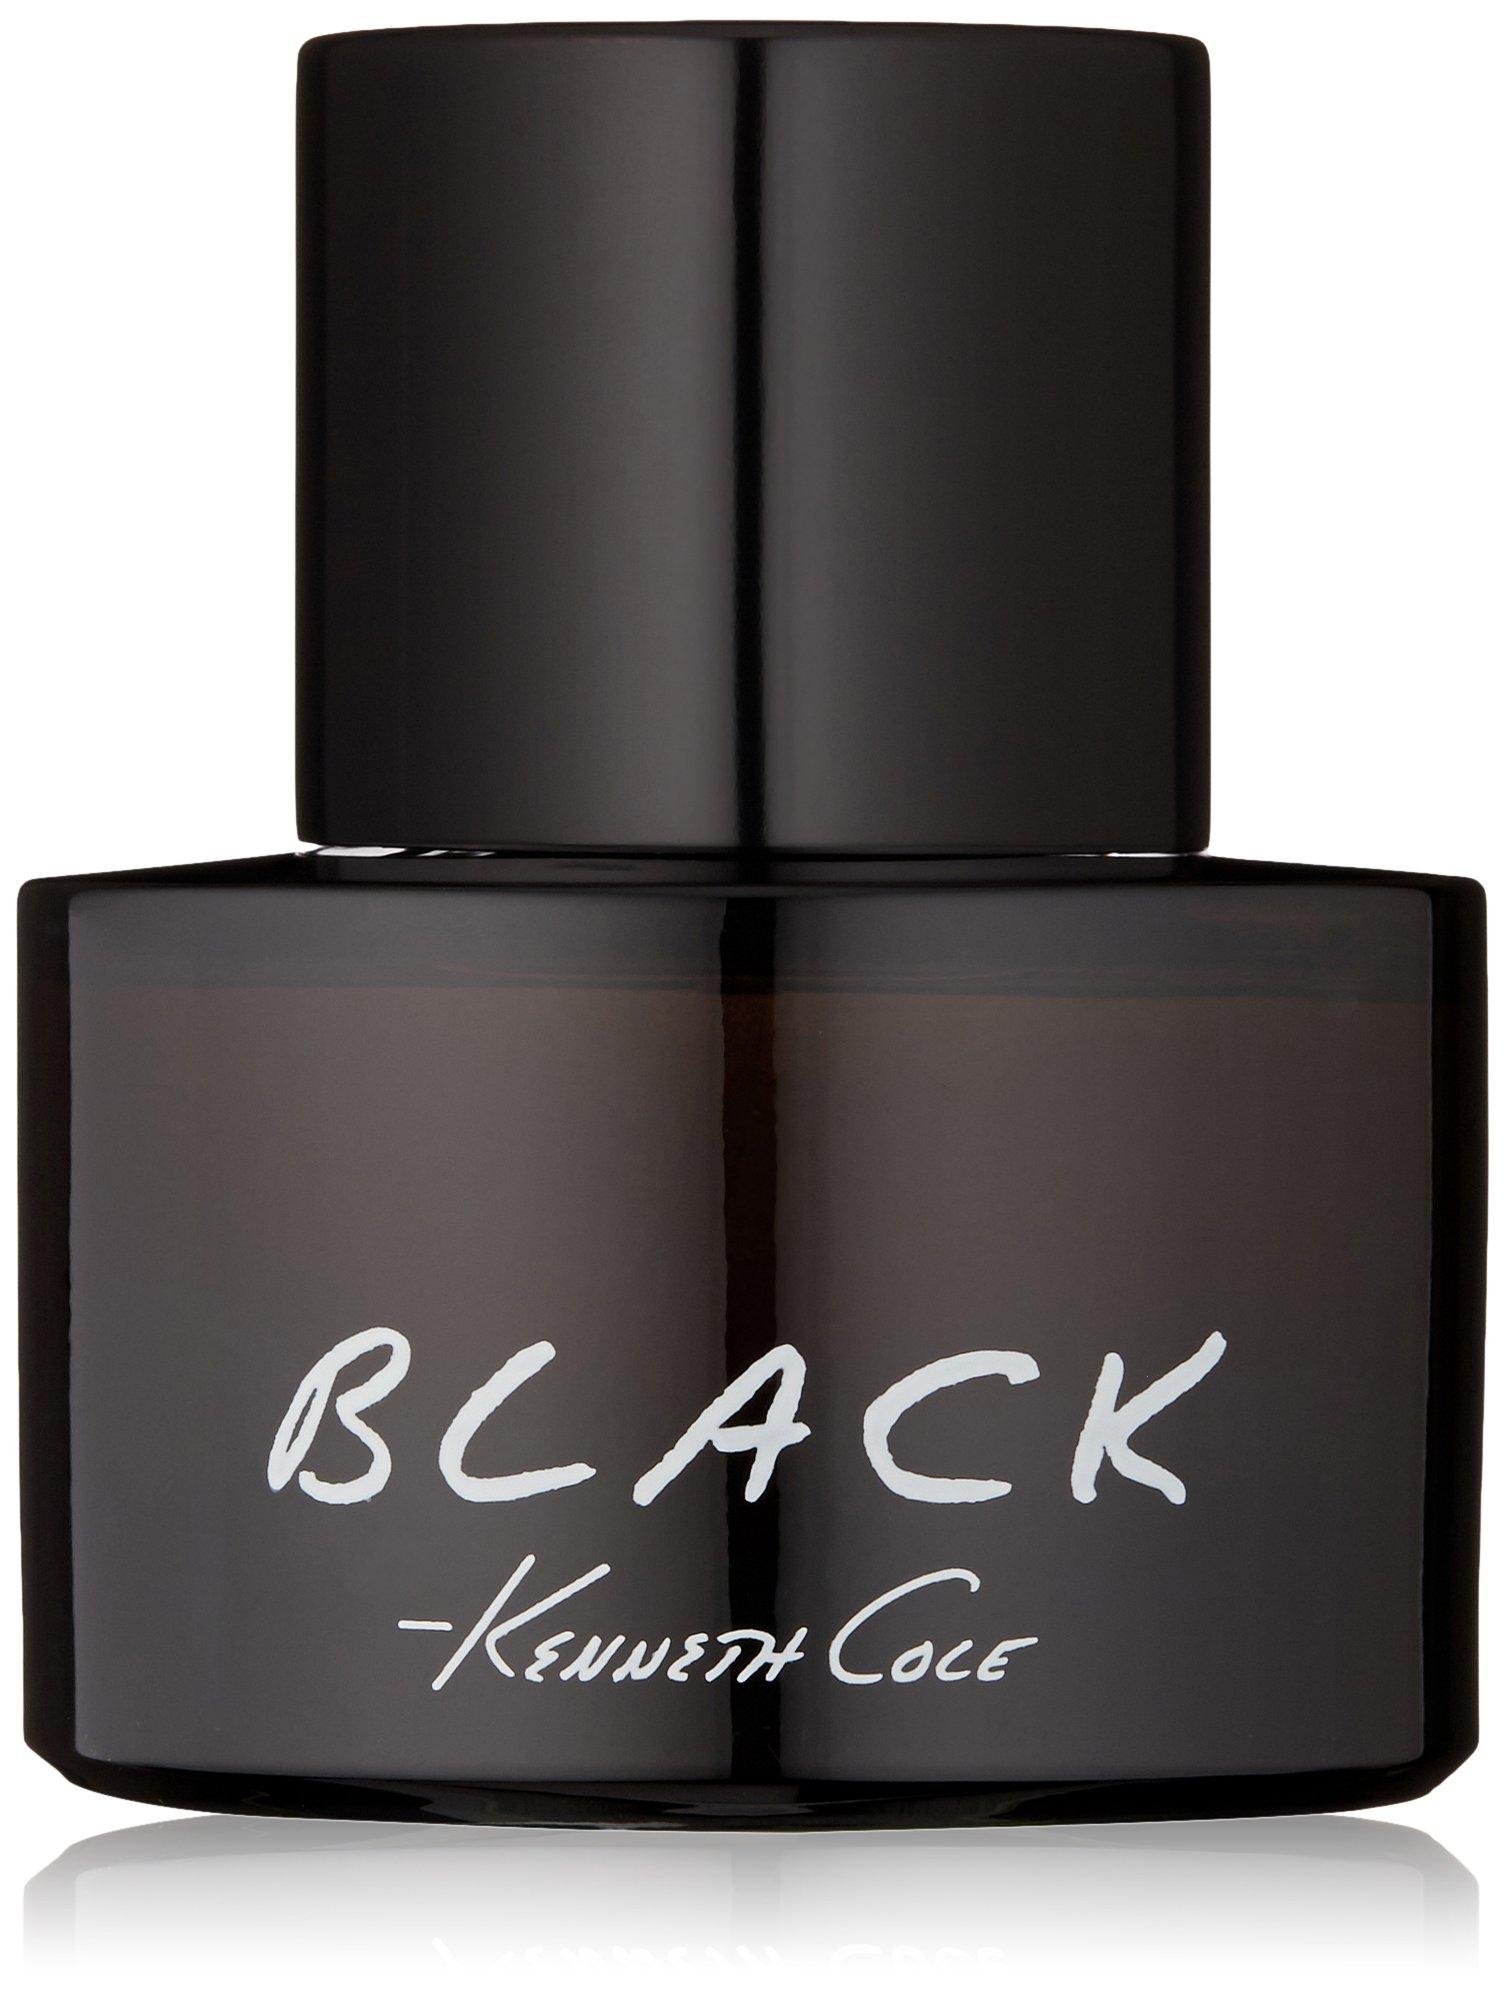 Kenneth Cole Black